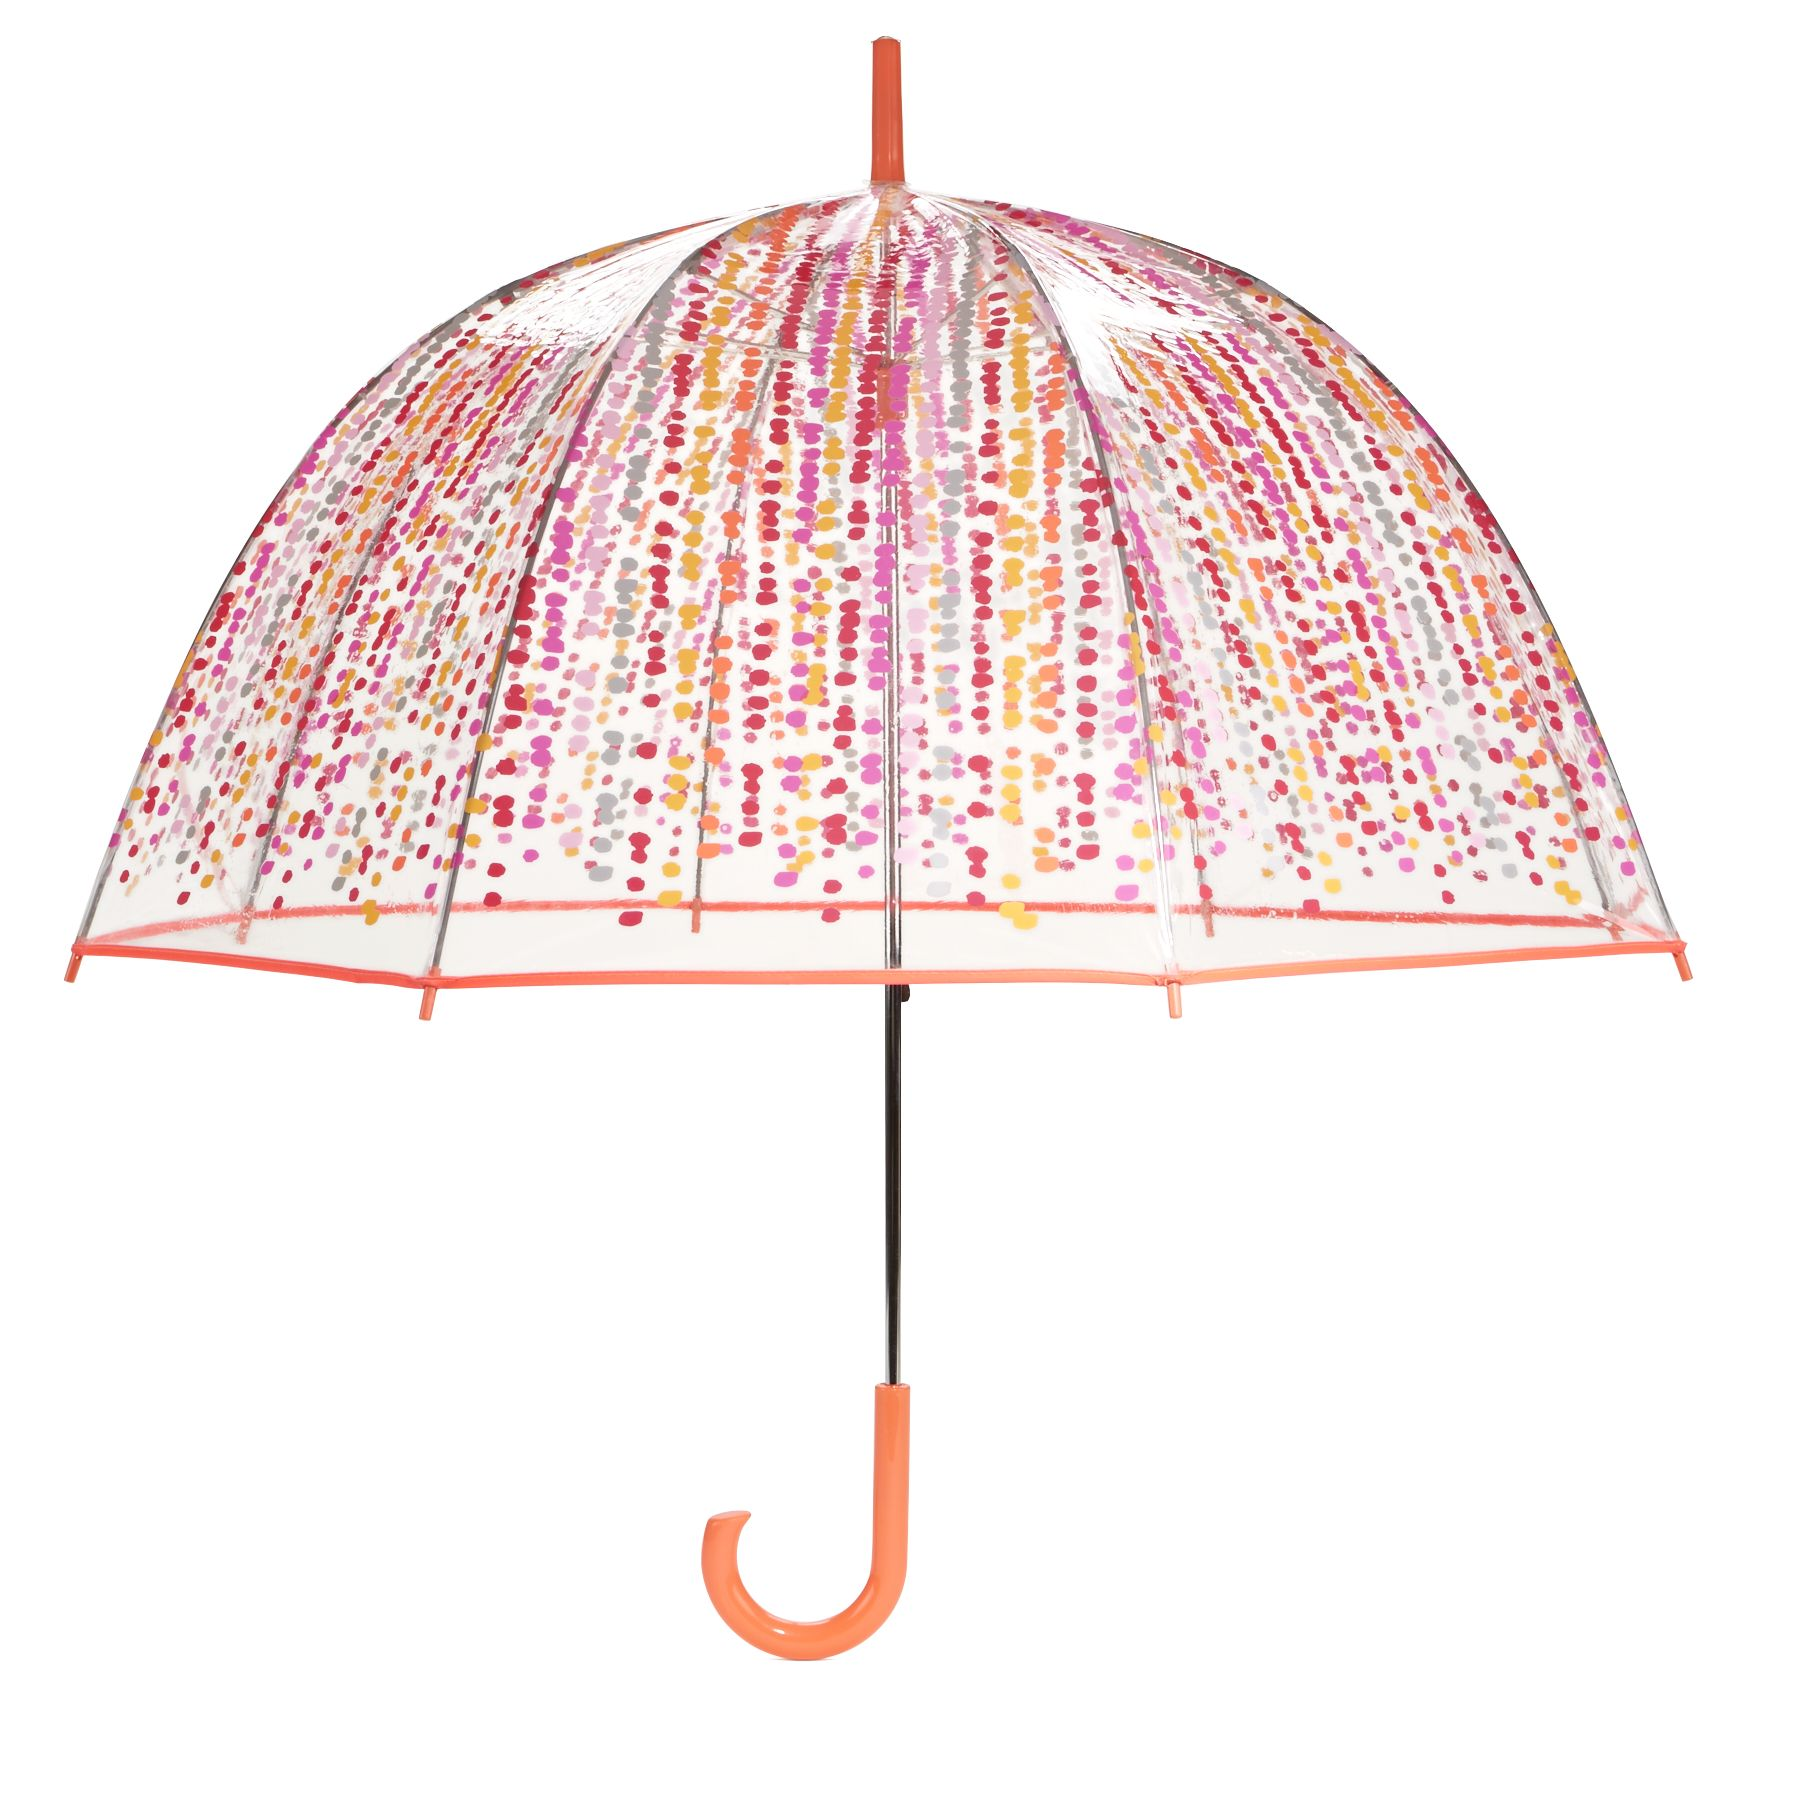 Vera Bradley Bubble Umbrella in Pixie Blooms